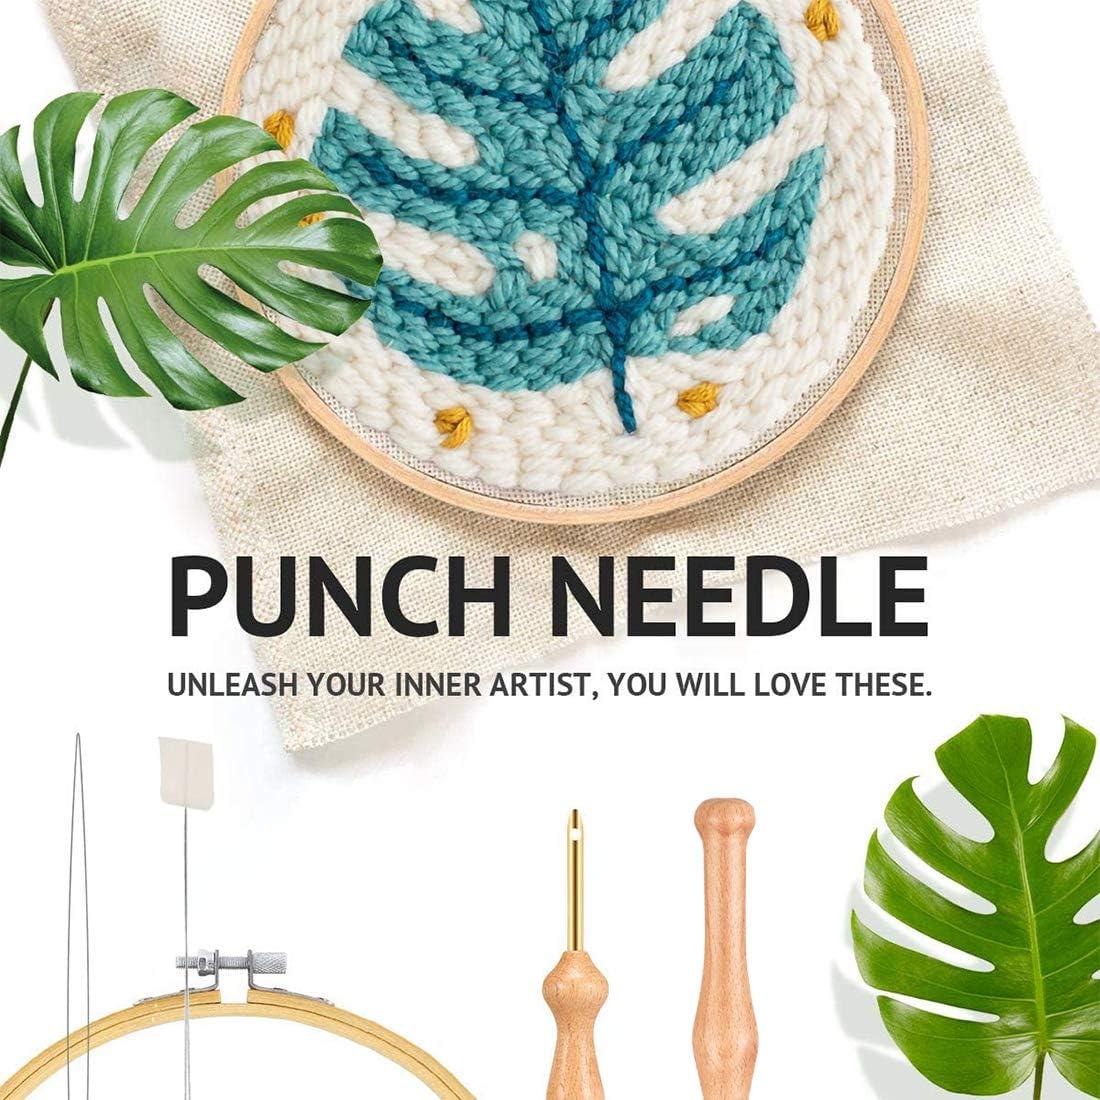 Punch Needle Embroidery Kit Needle Weaving Tools for DIY 4 Needles + 4 Needle threaders